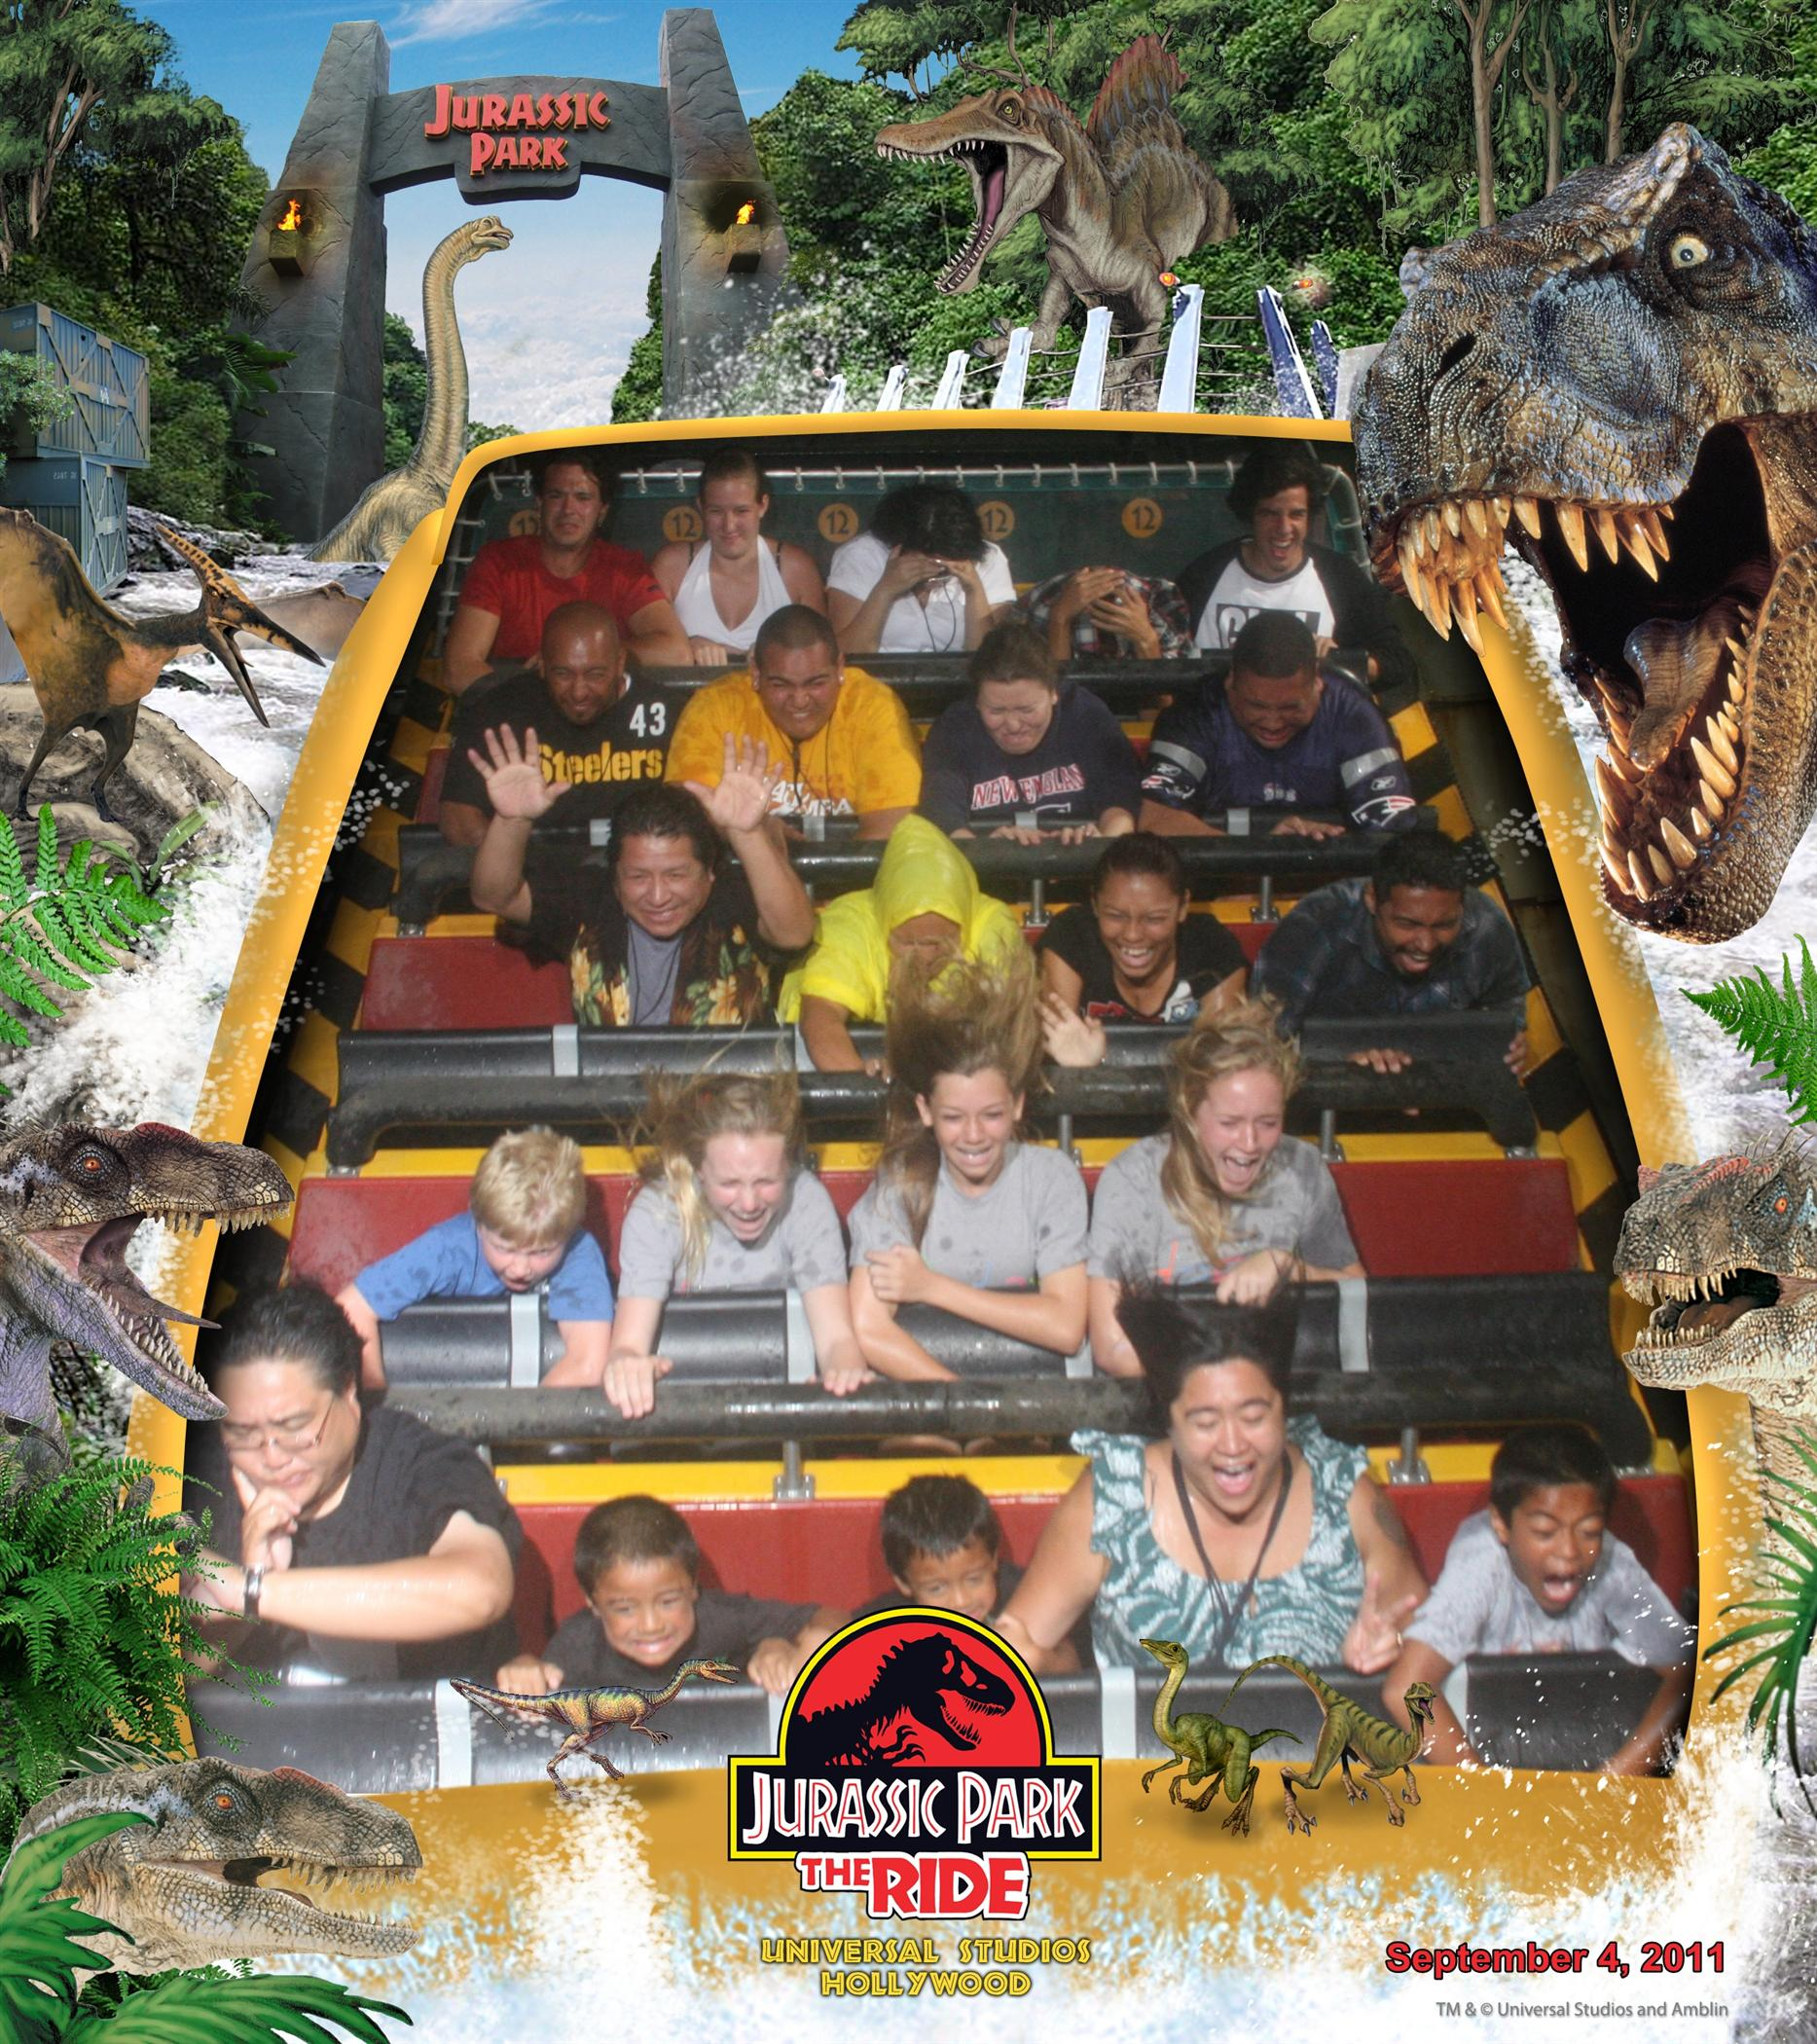 Jurassic Park Ride Photo Universal Studios Hollywood